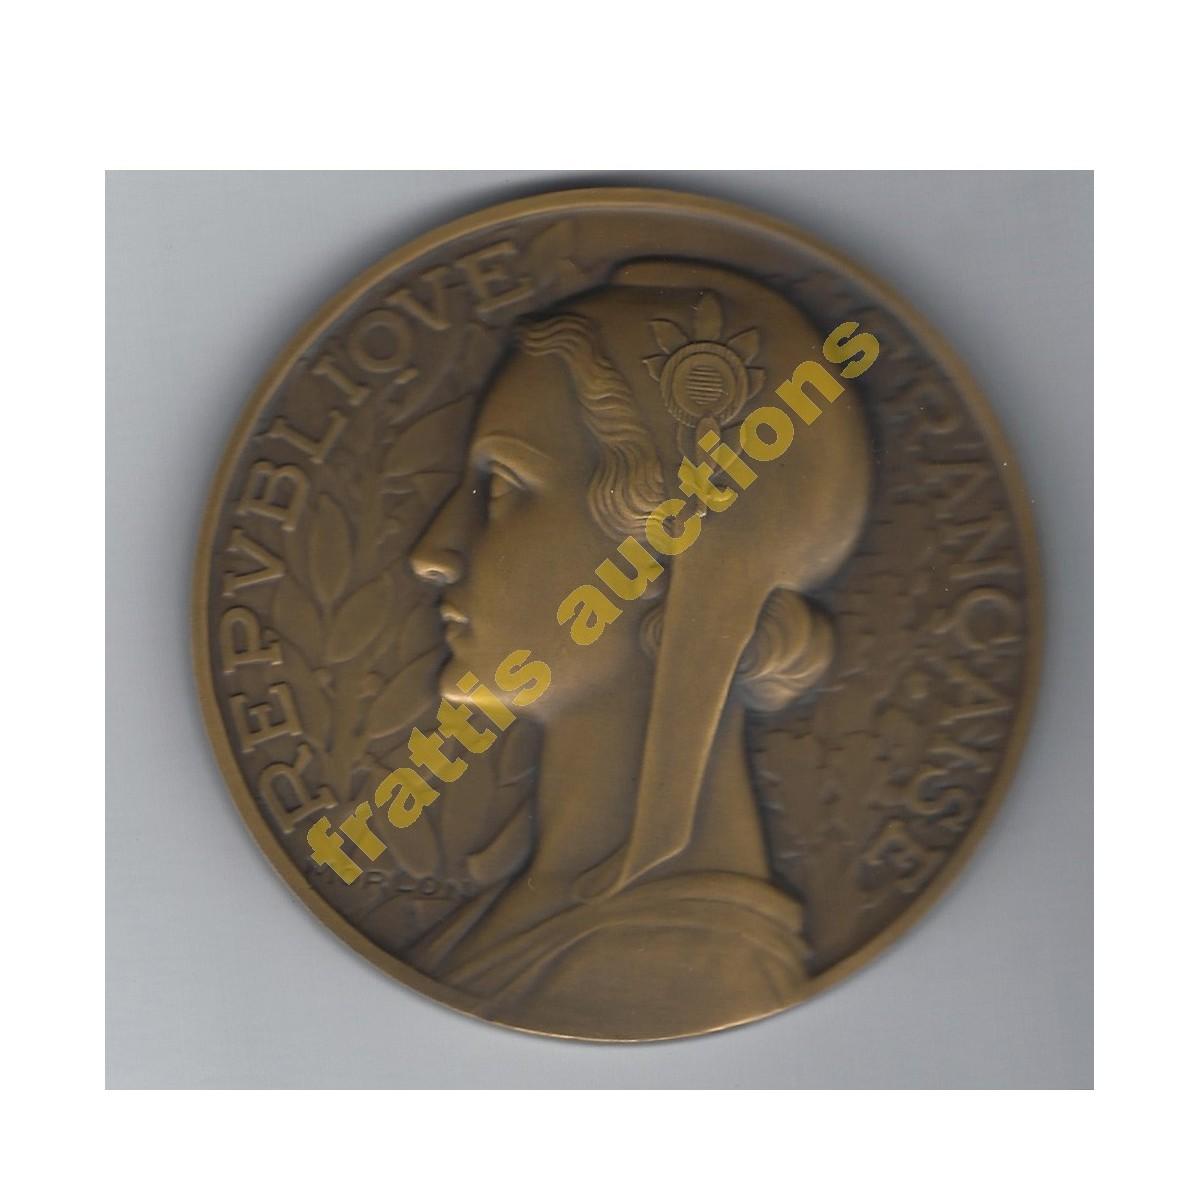 REPUBLIQUE FRANCAISE, Μετάλλιο